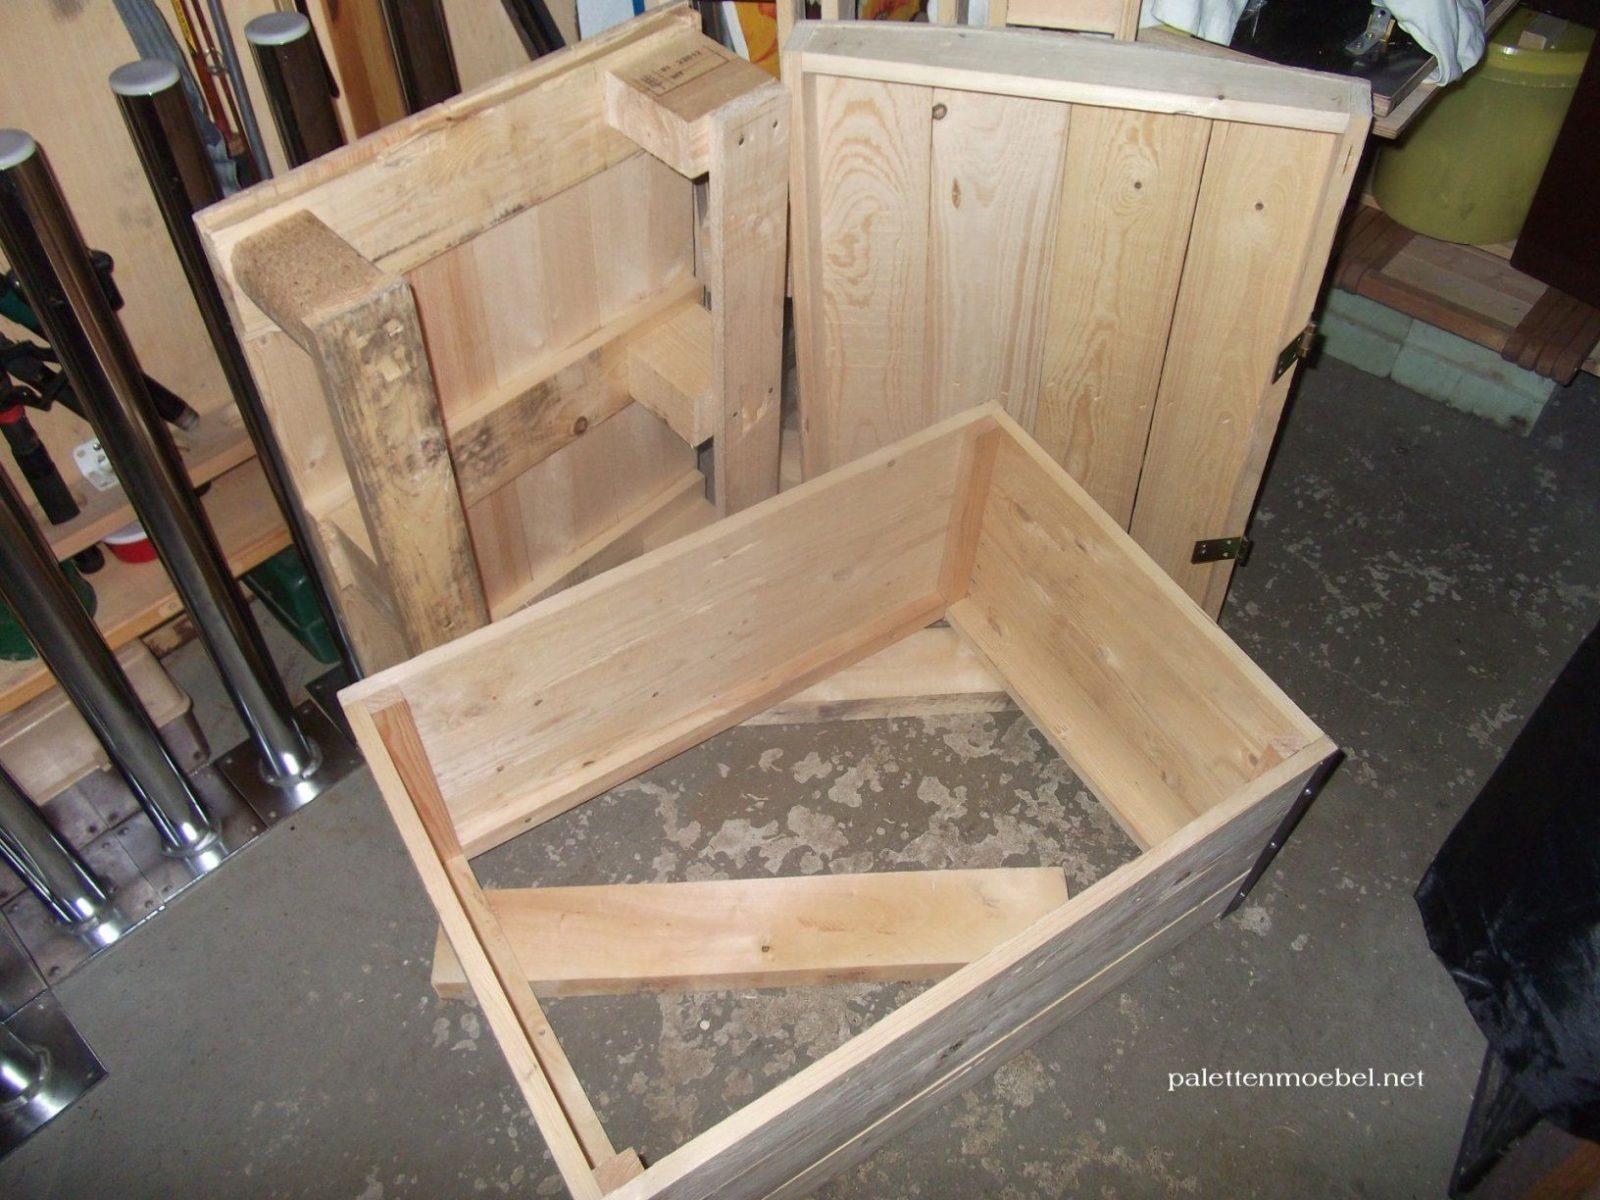 kiste selber bauen gd15 hitoiro von holztruhe selber bauen anleitung bild haus design ideen. Black Bedroom Furniture Sets. Home Design Ideas